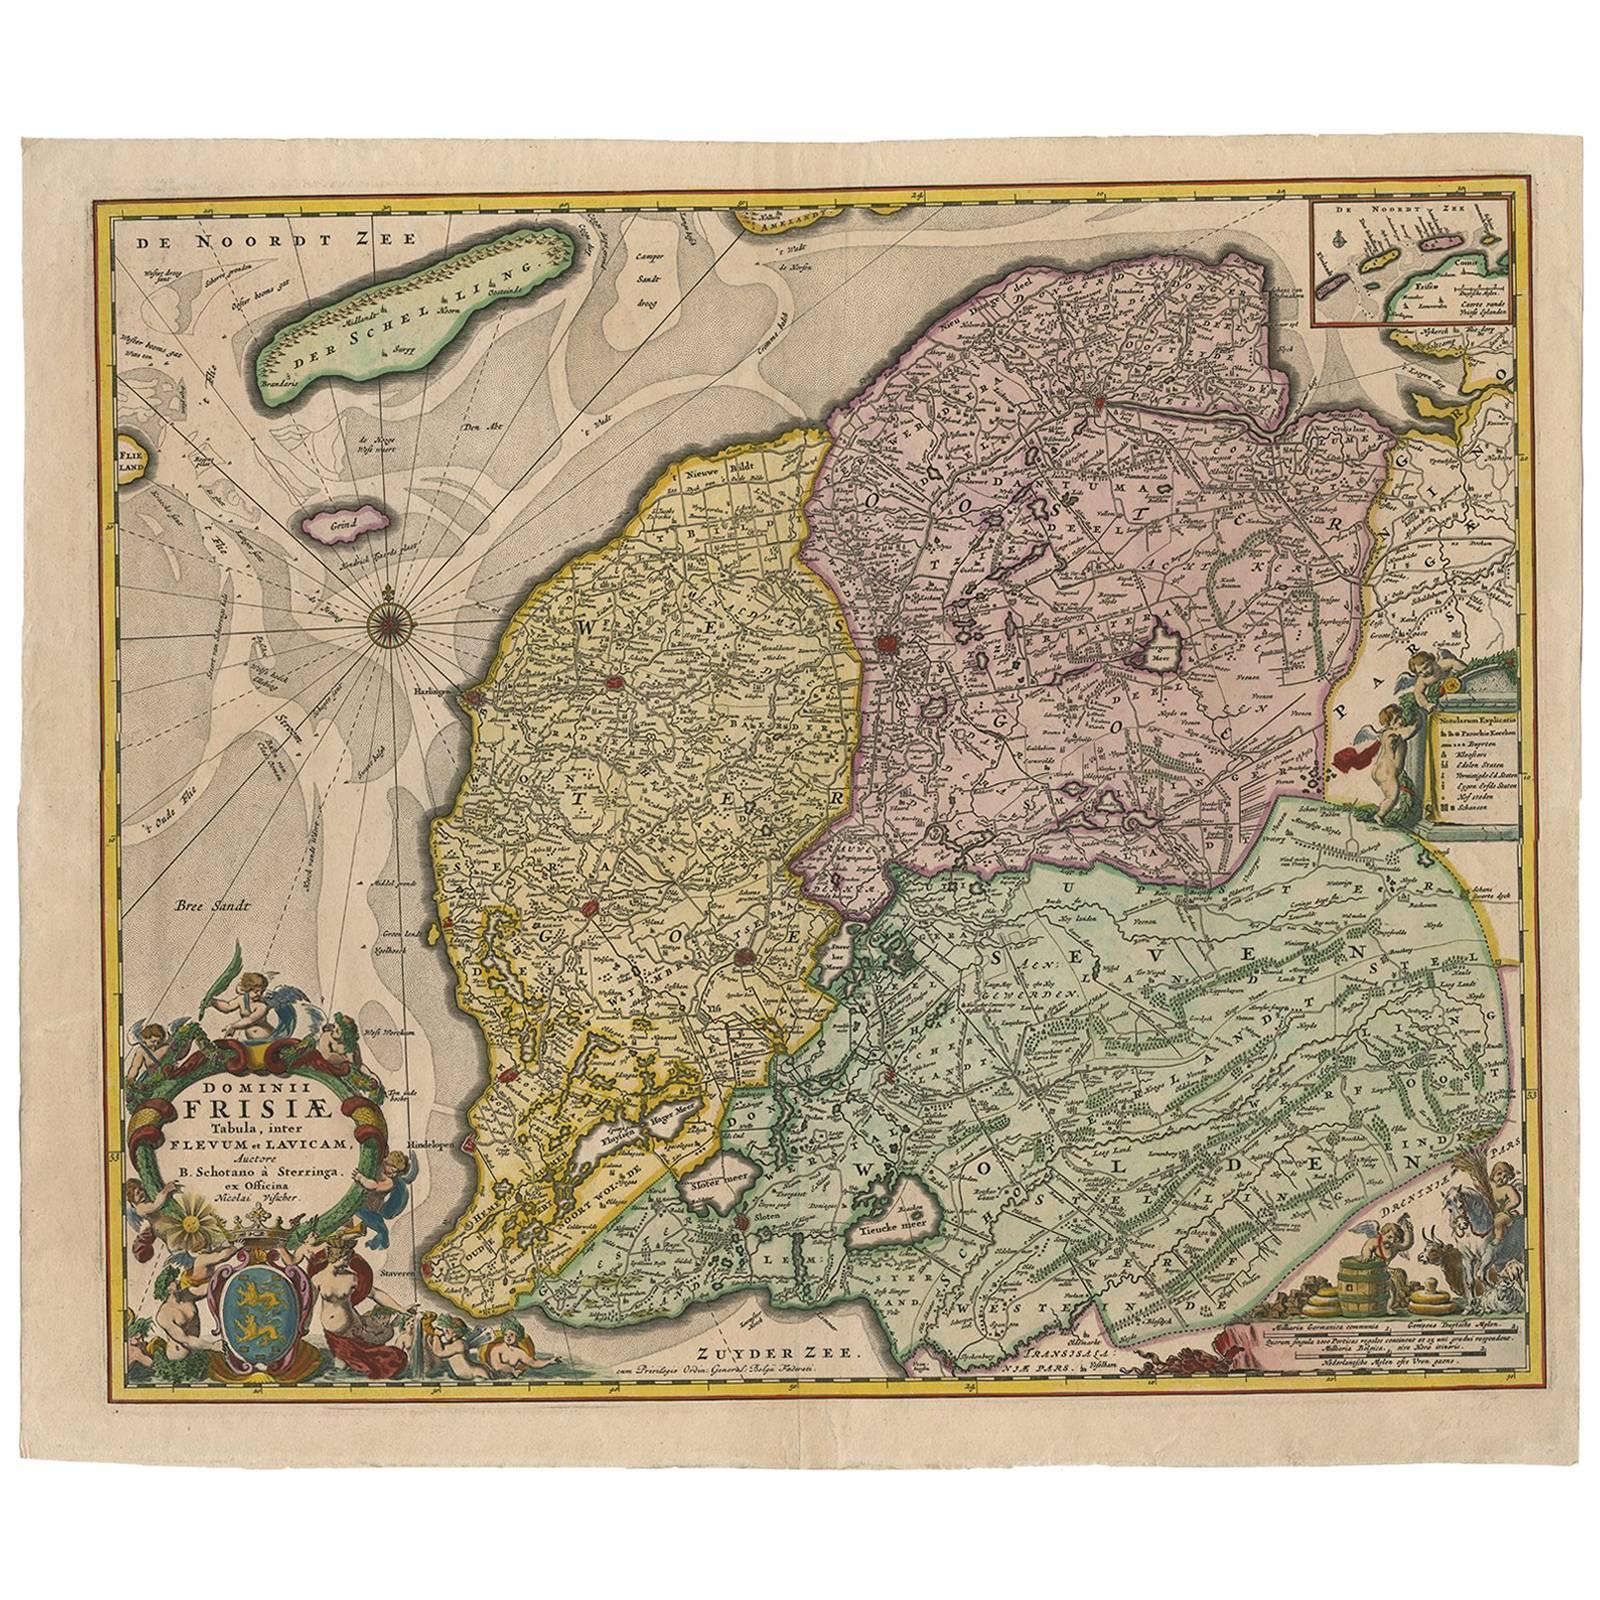 Antique Map of Friesland 'The Netherlands' by N. Visscher, circa 1670